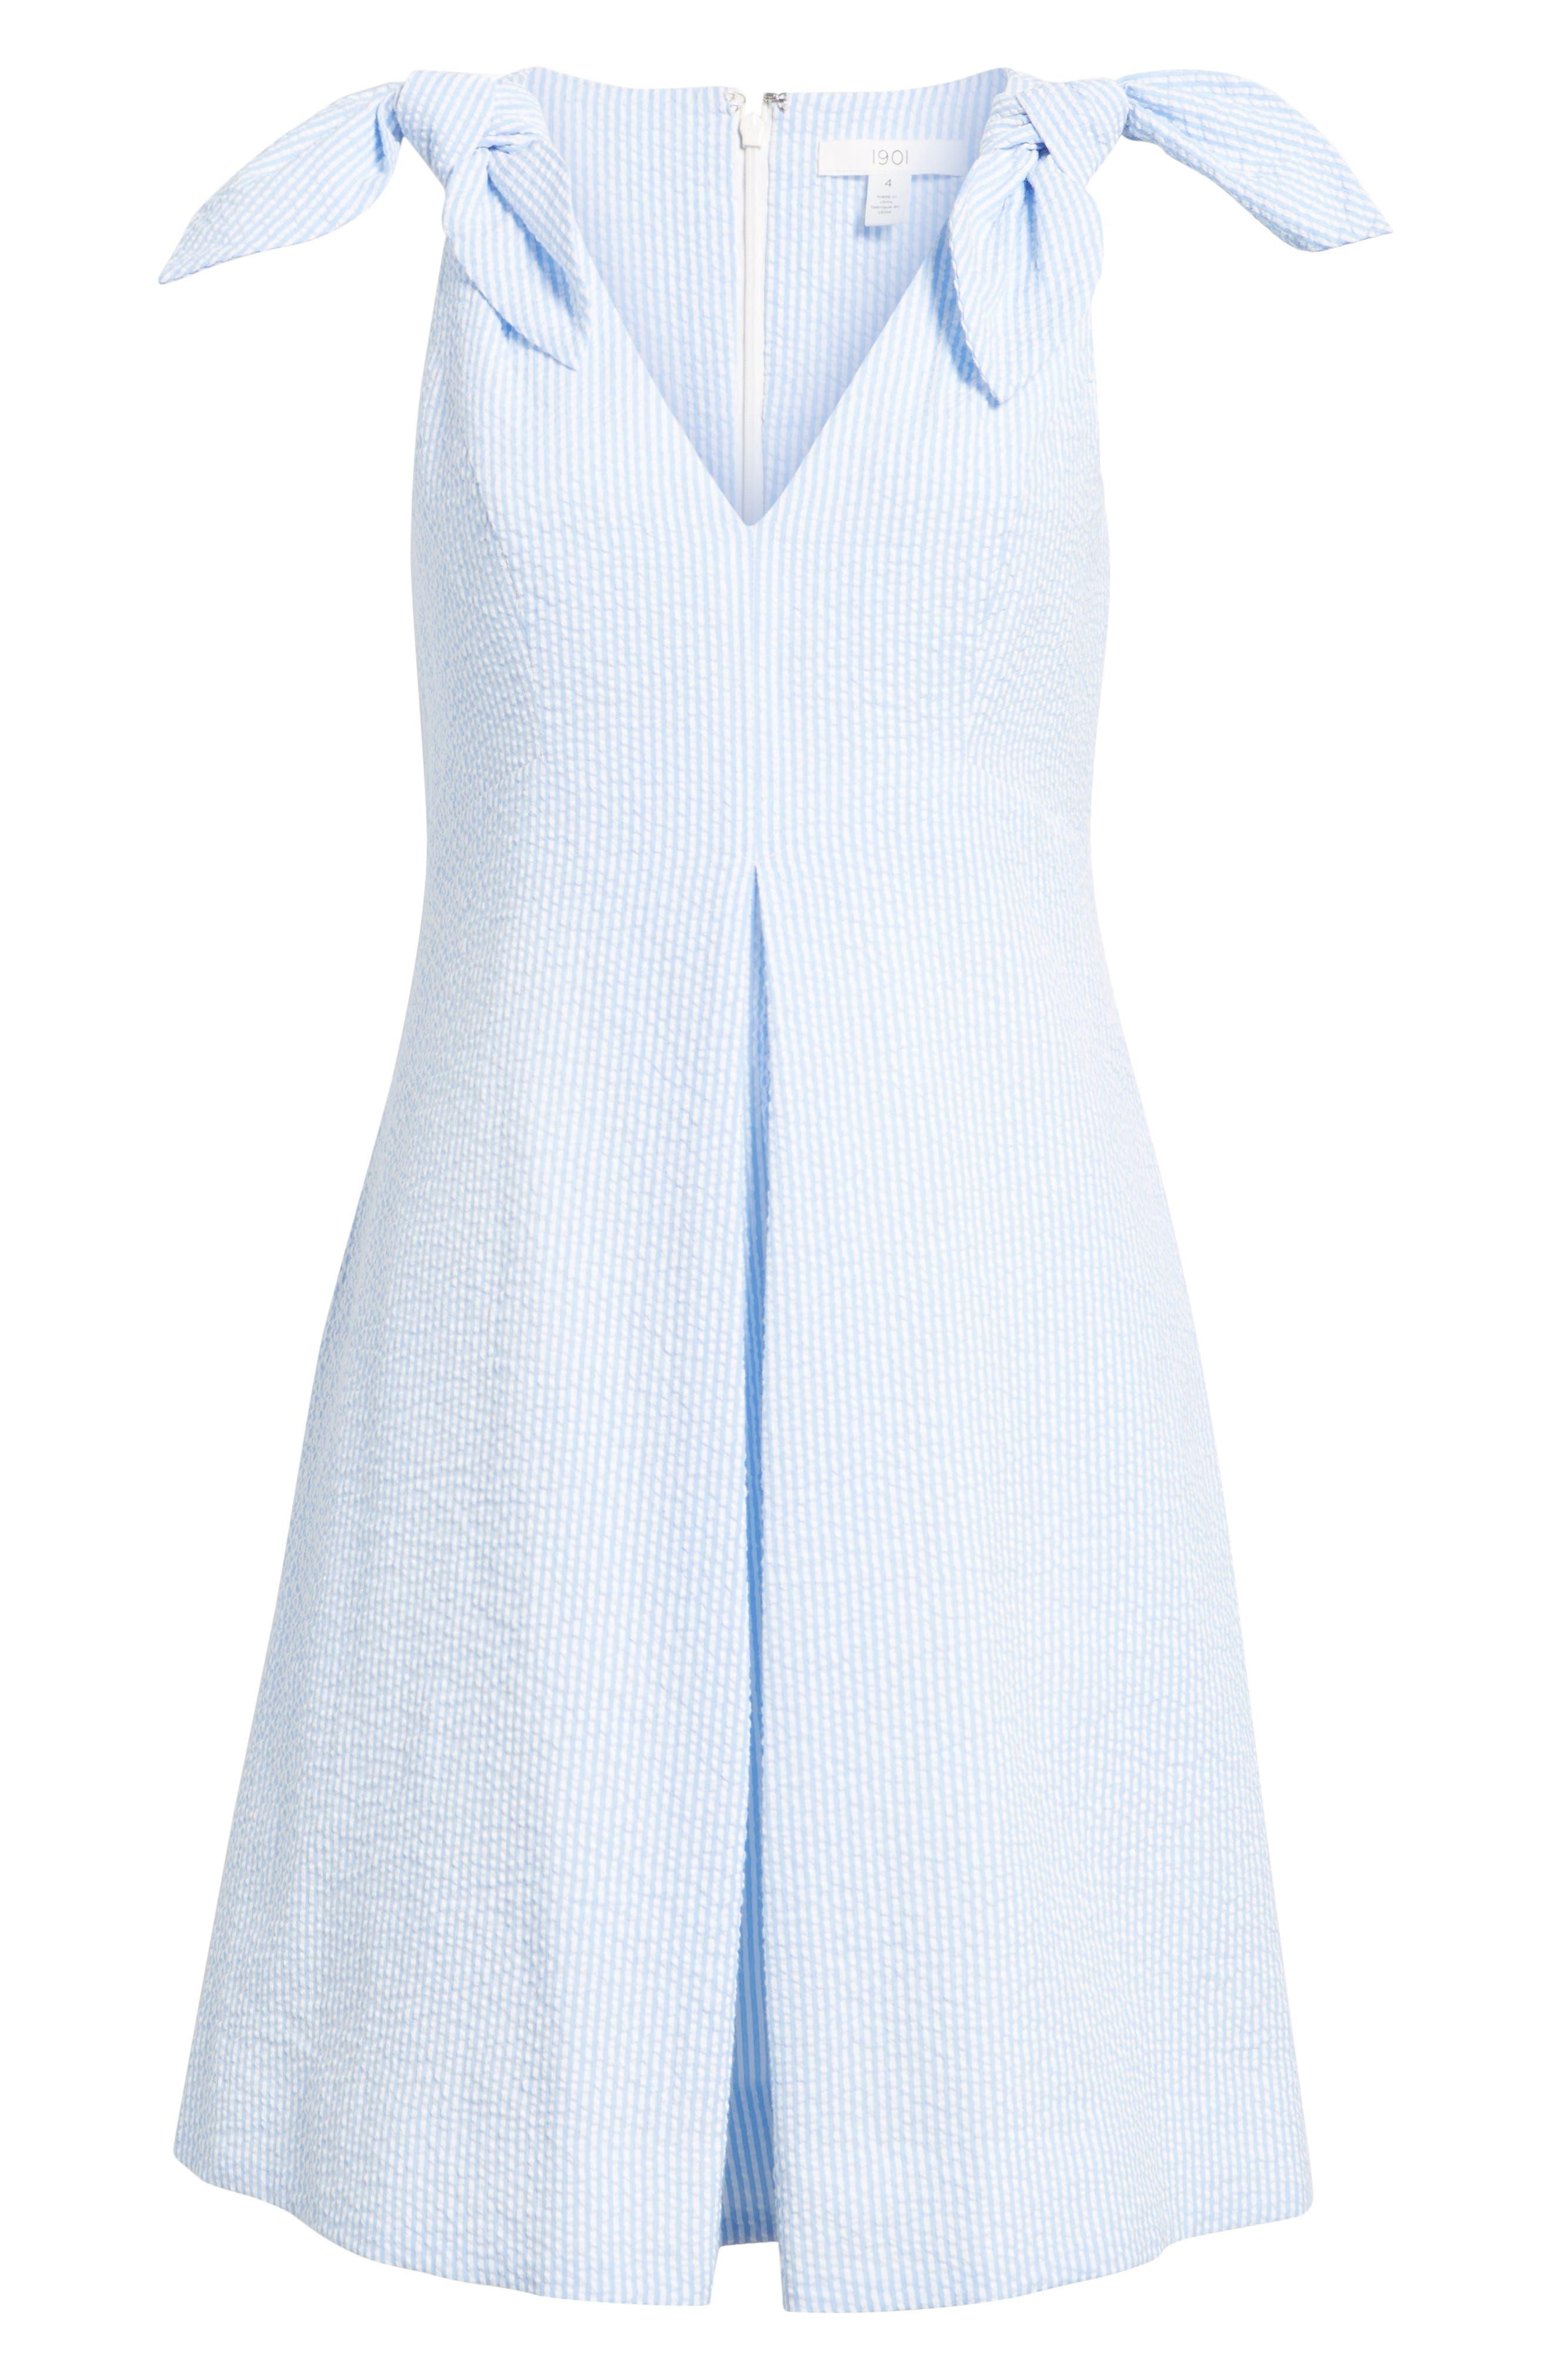 Bow Seersucker Dress,                             Alternate thumbnail 6, color,                             420